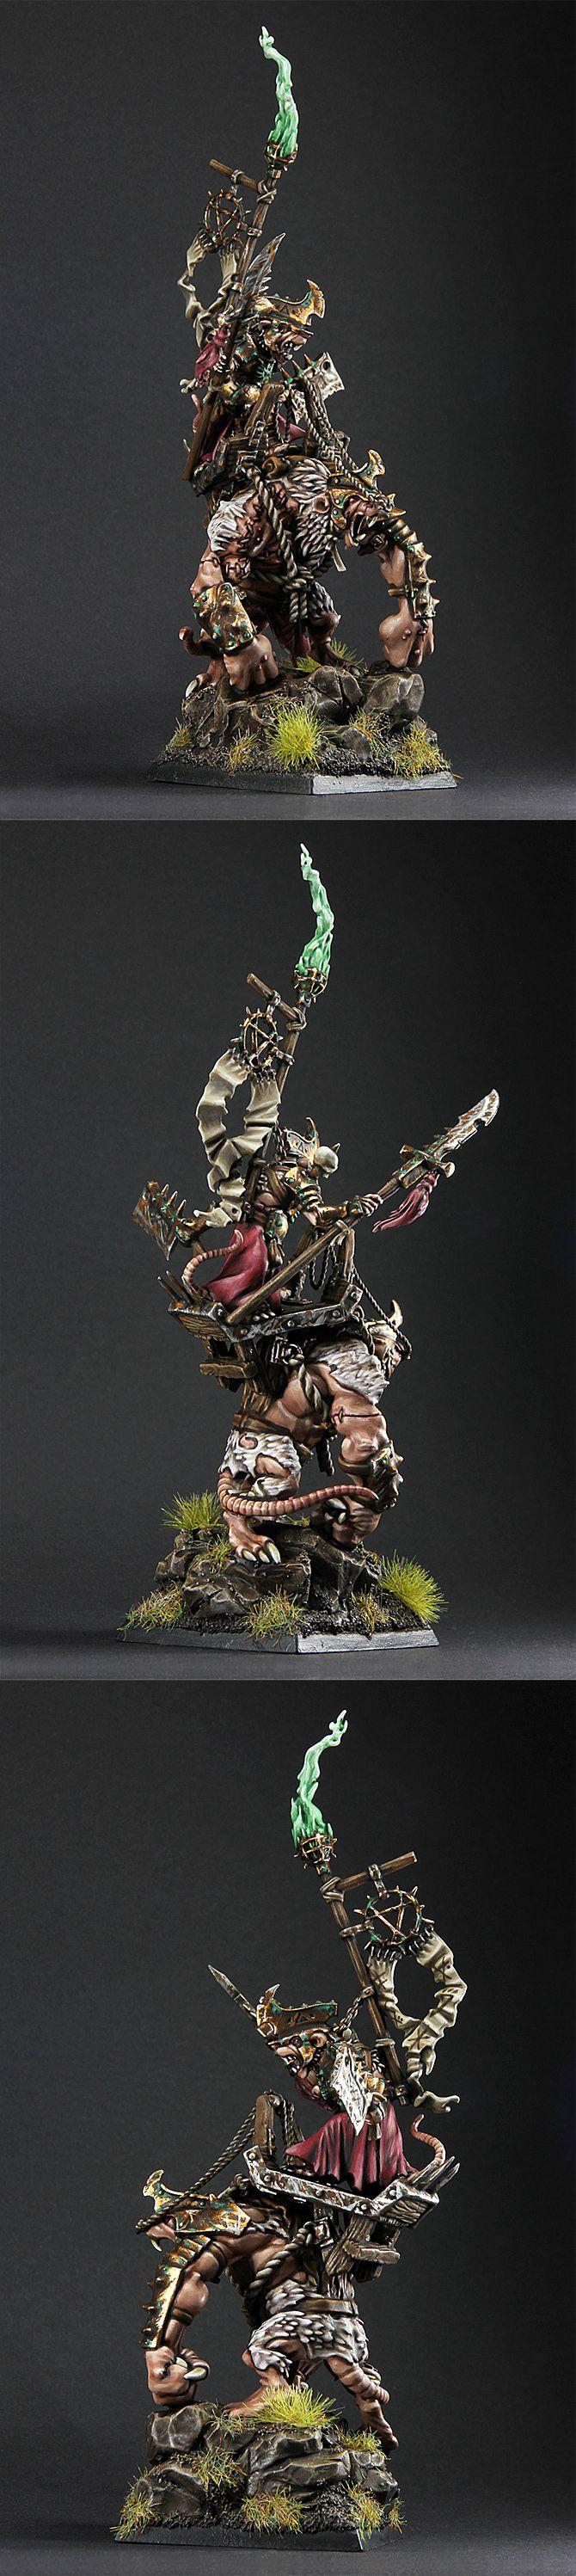 Skaven Warlord on Rat Ogre Bonebreaker